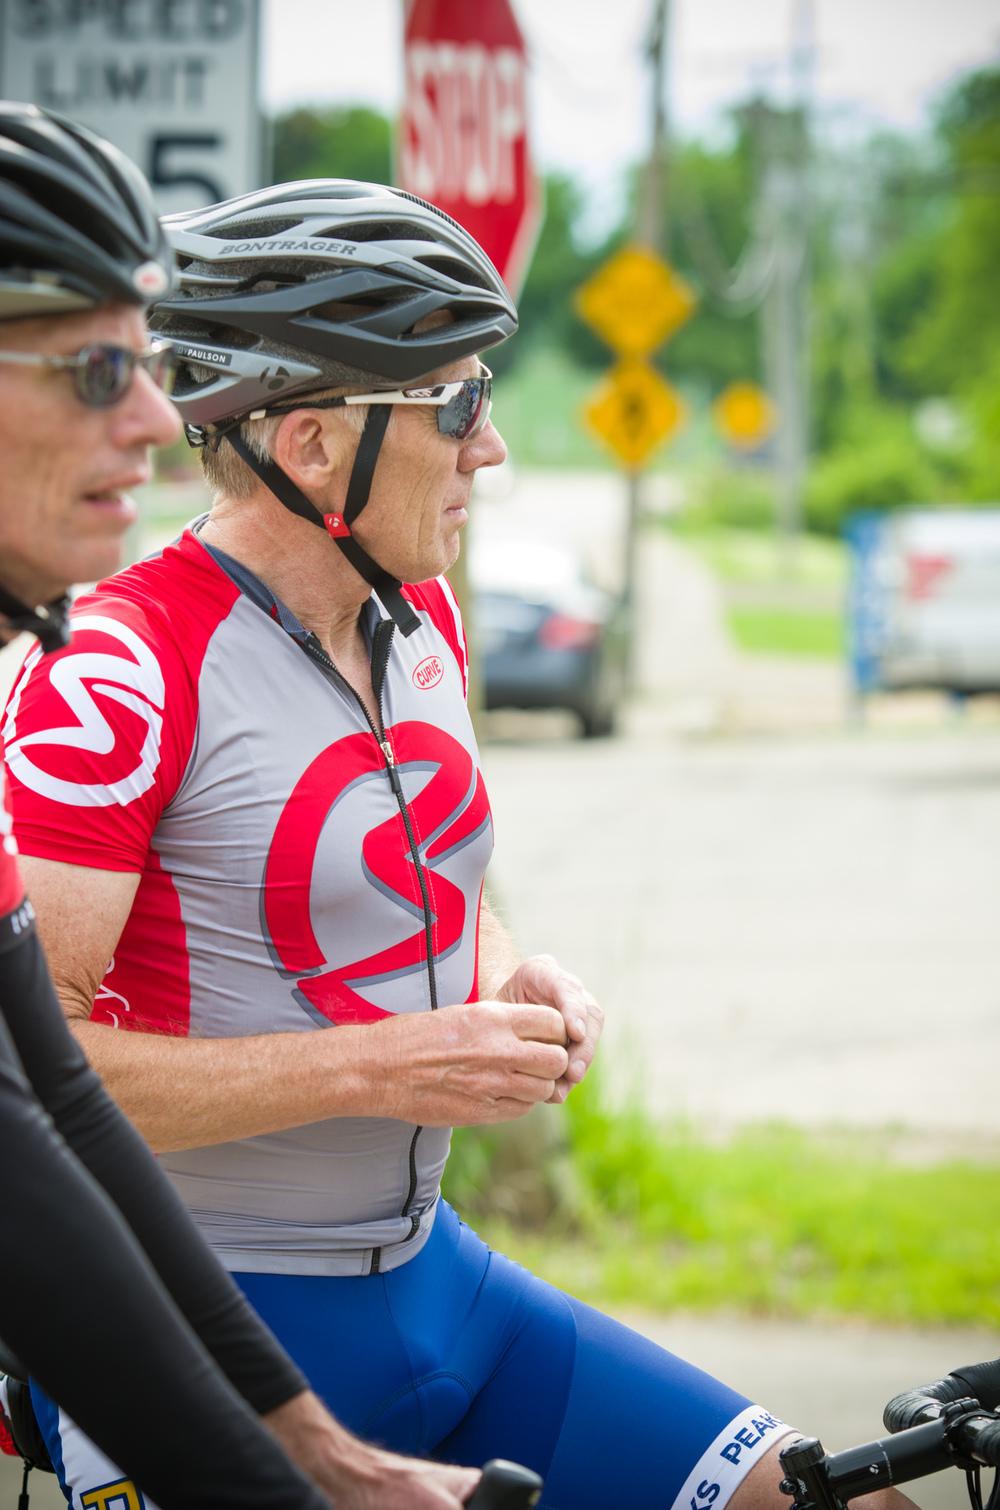 20140615_SpeedCycling_-74.jpg